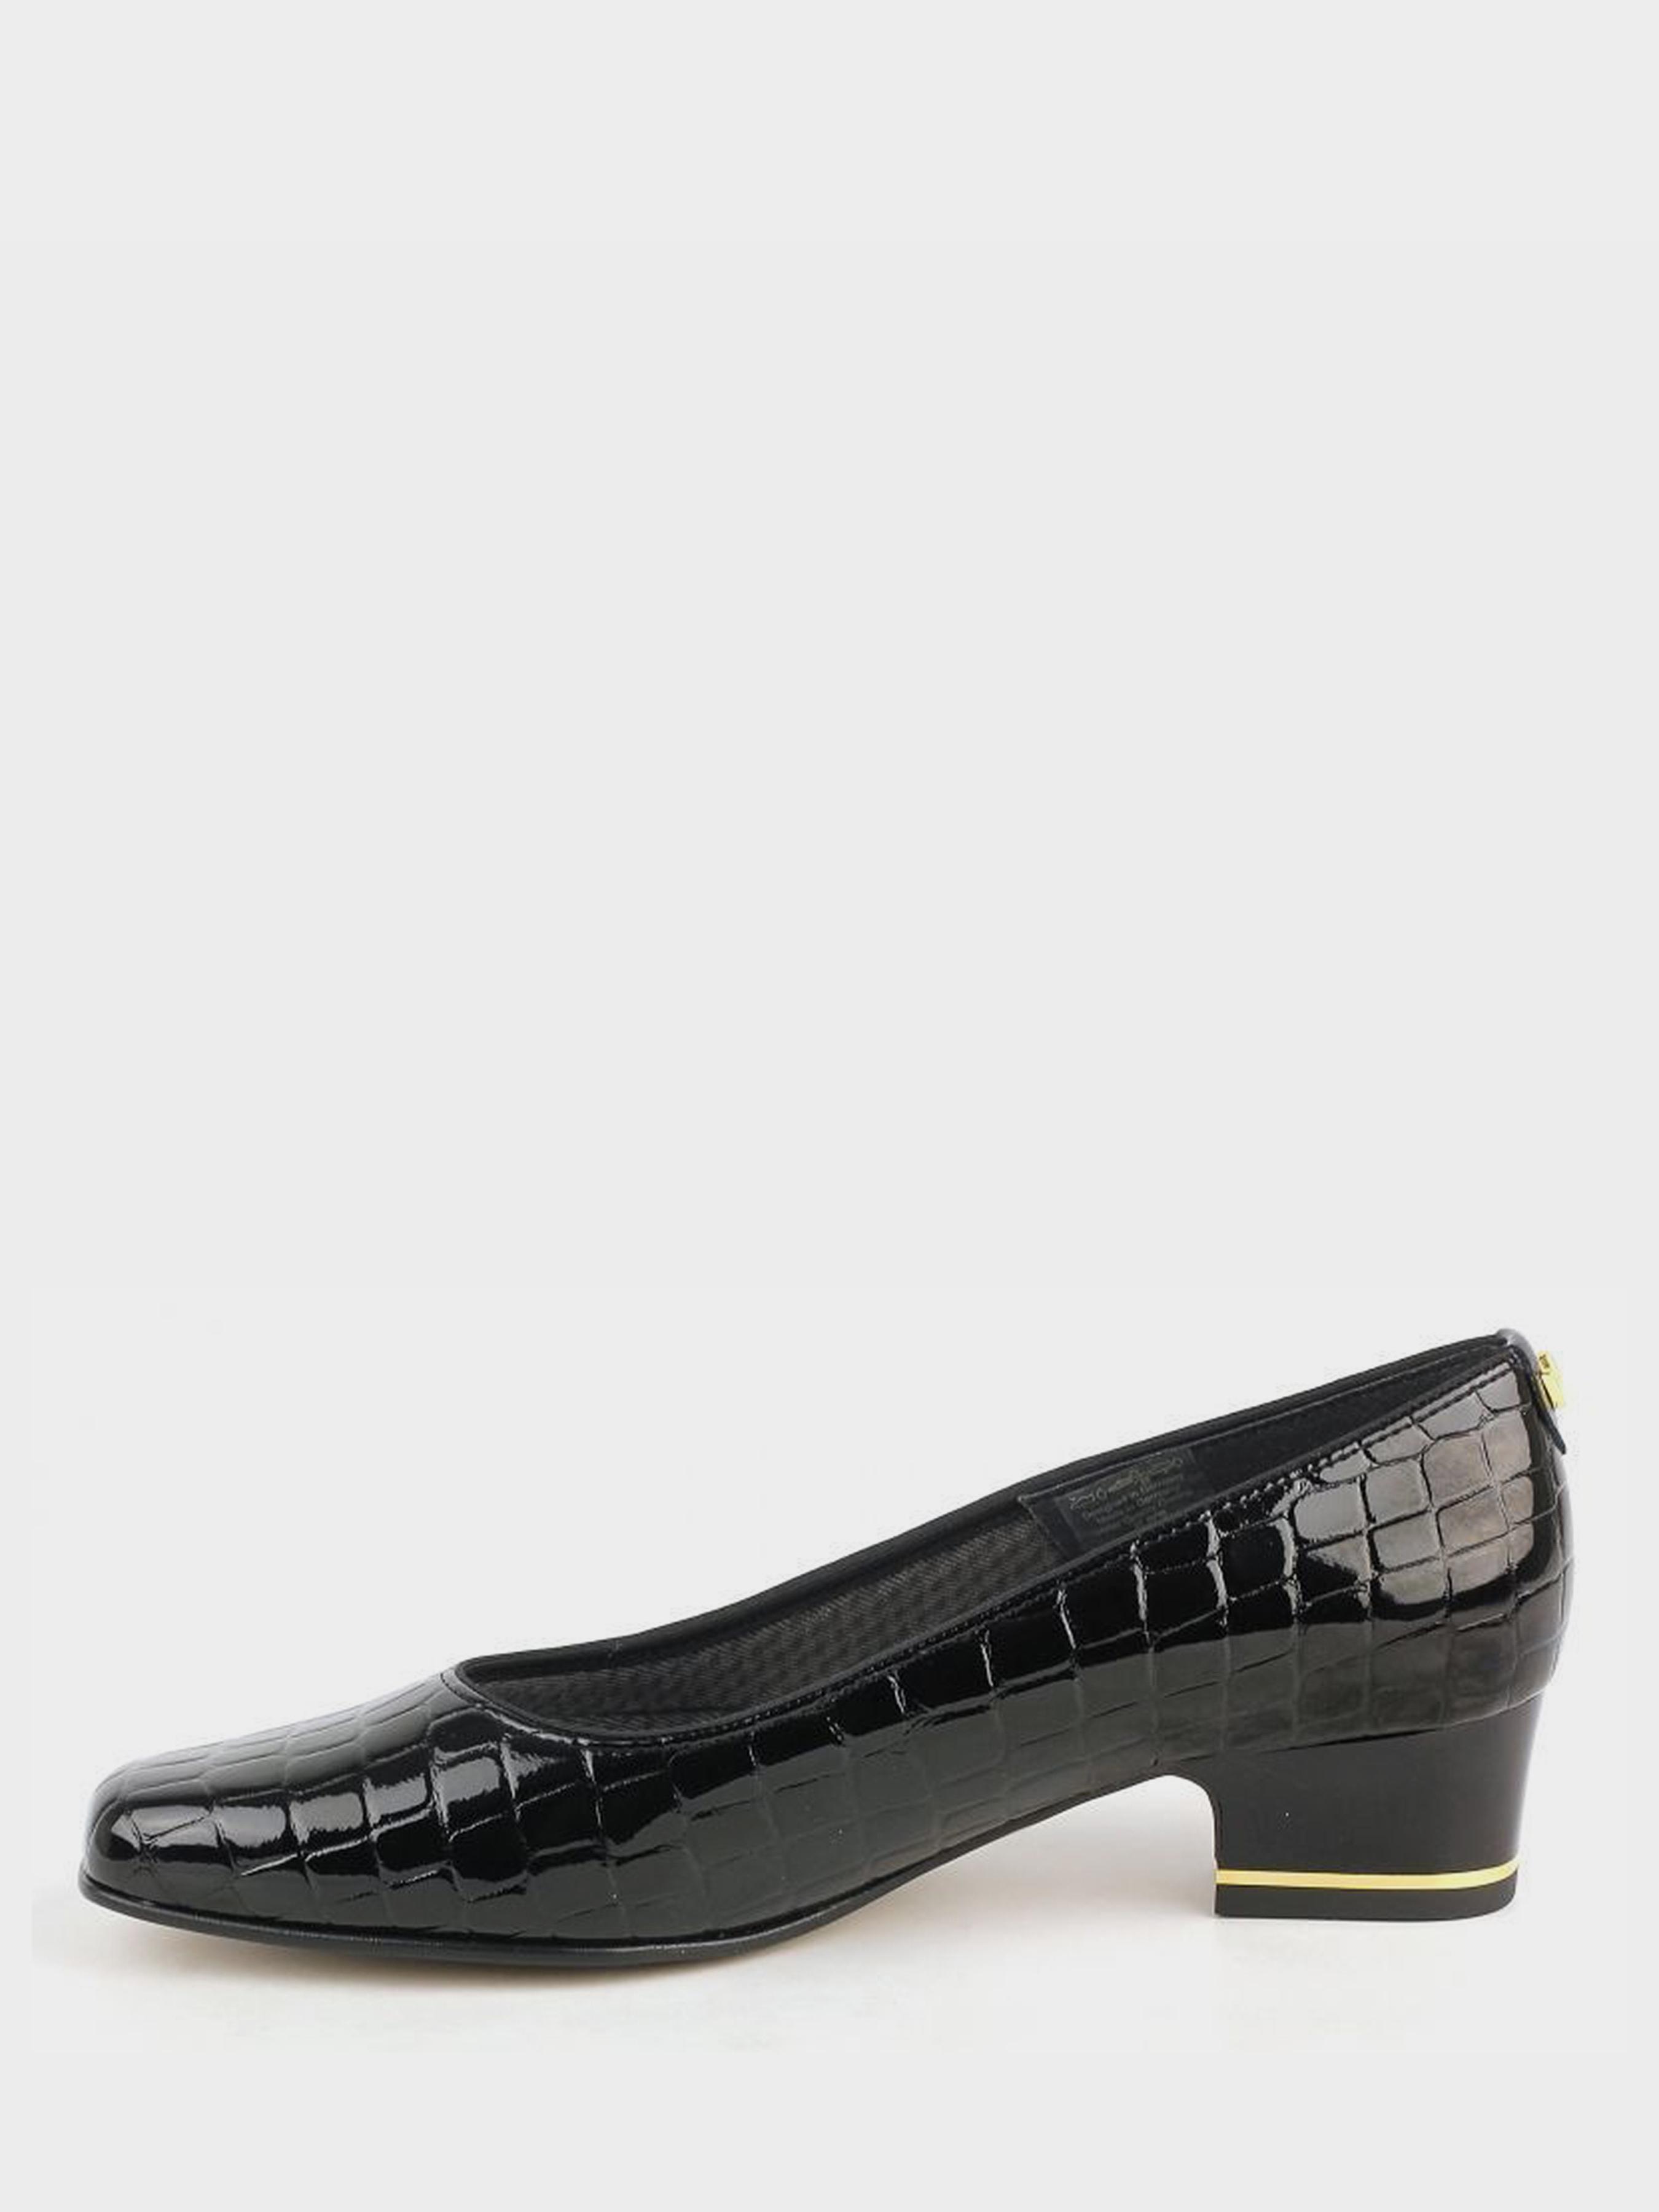 Туфли женские ARA туфли жен. AA1106 продажа, 2017